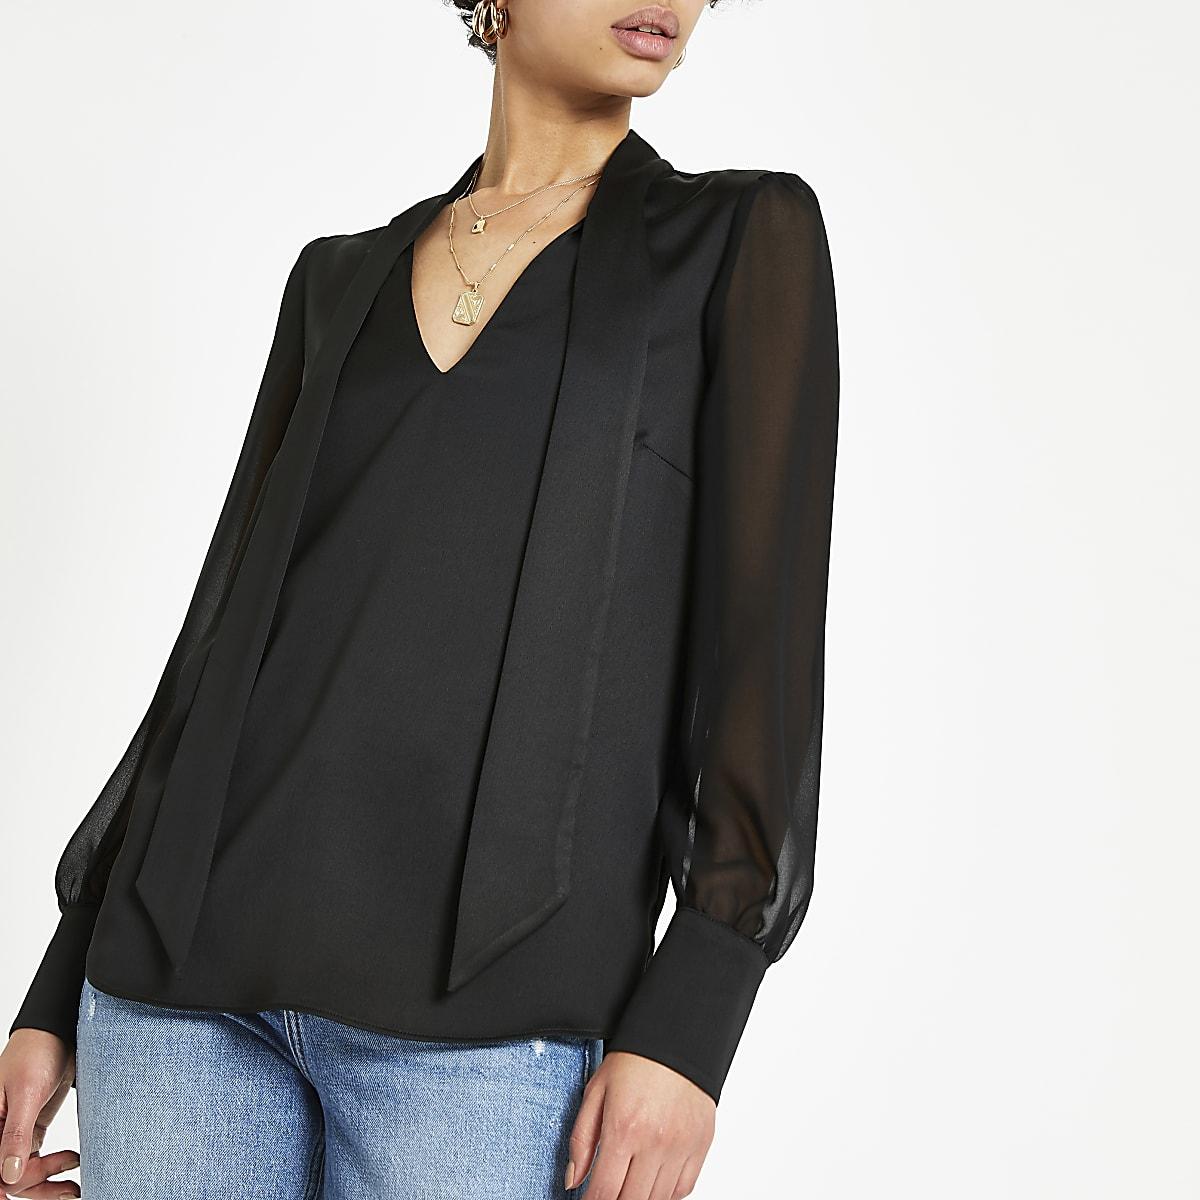 Black satin tie neck blouse